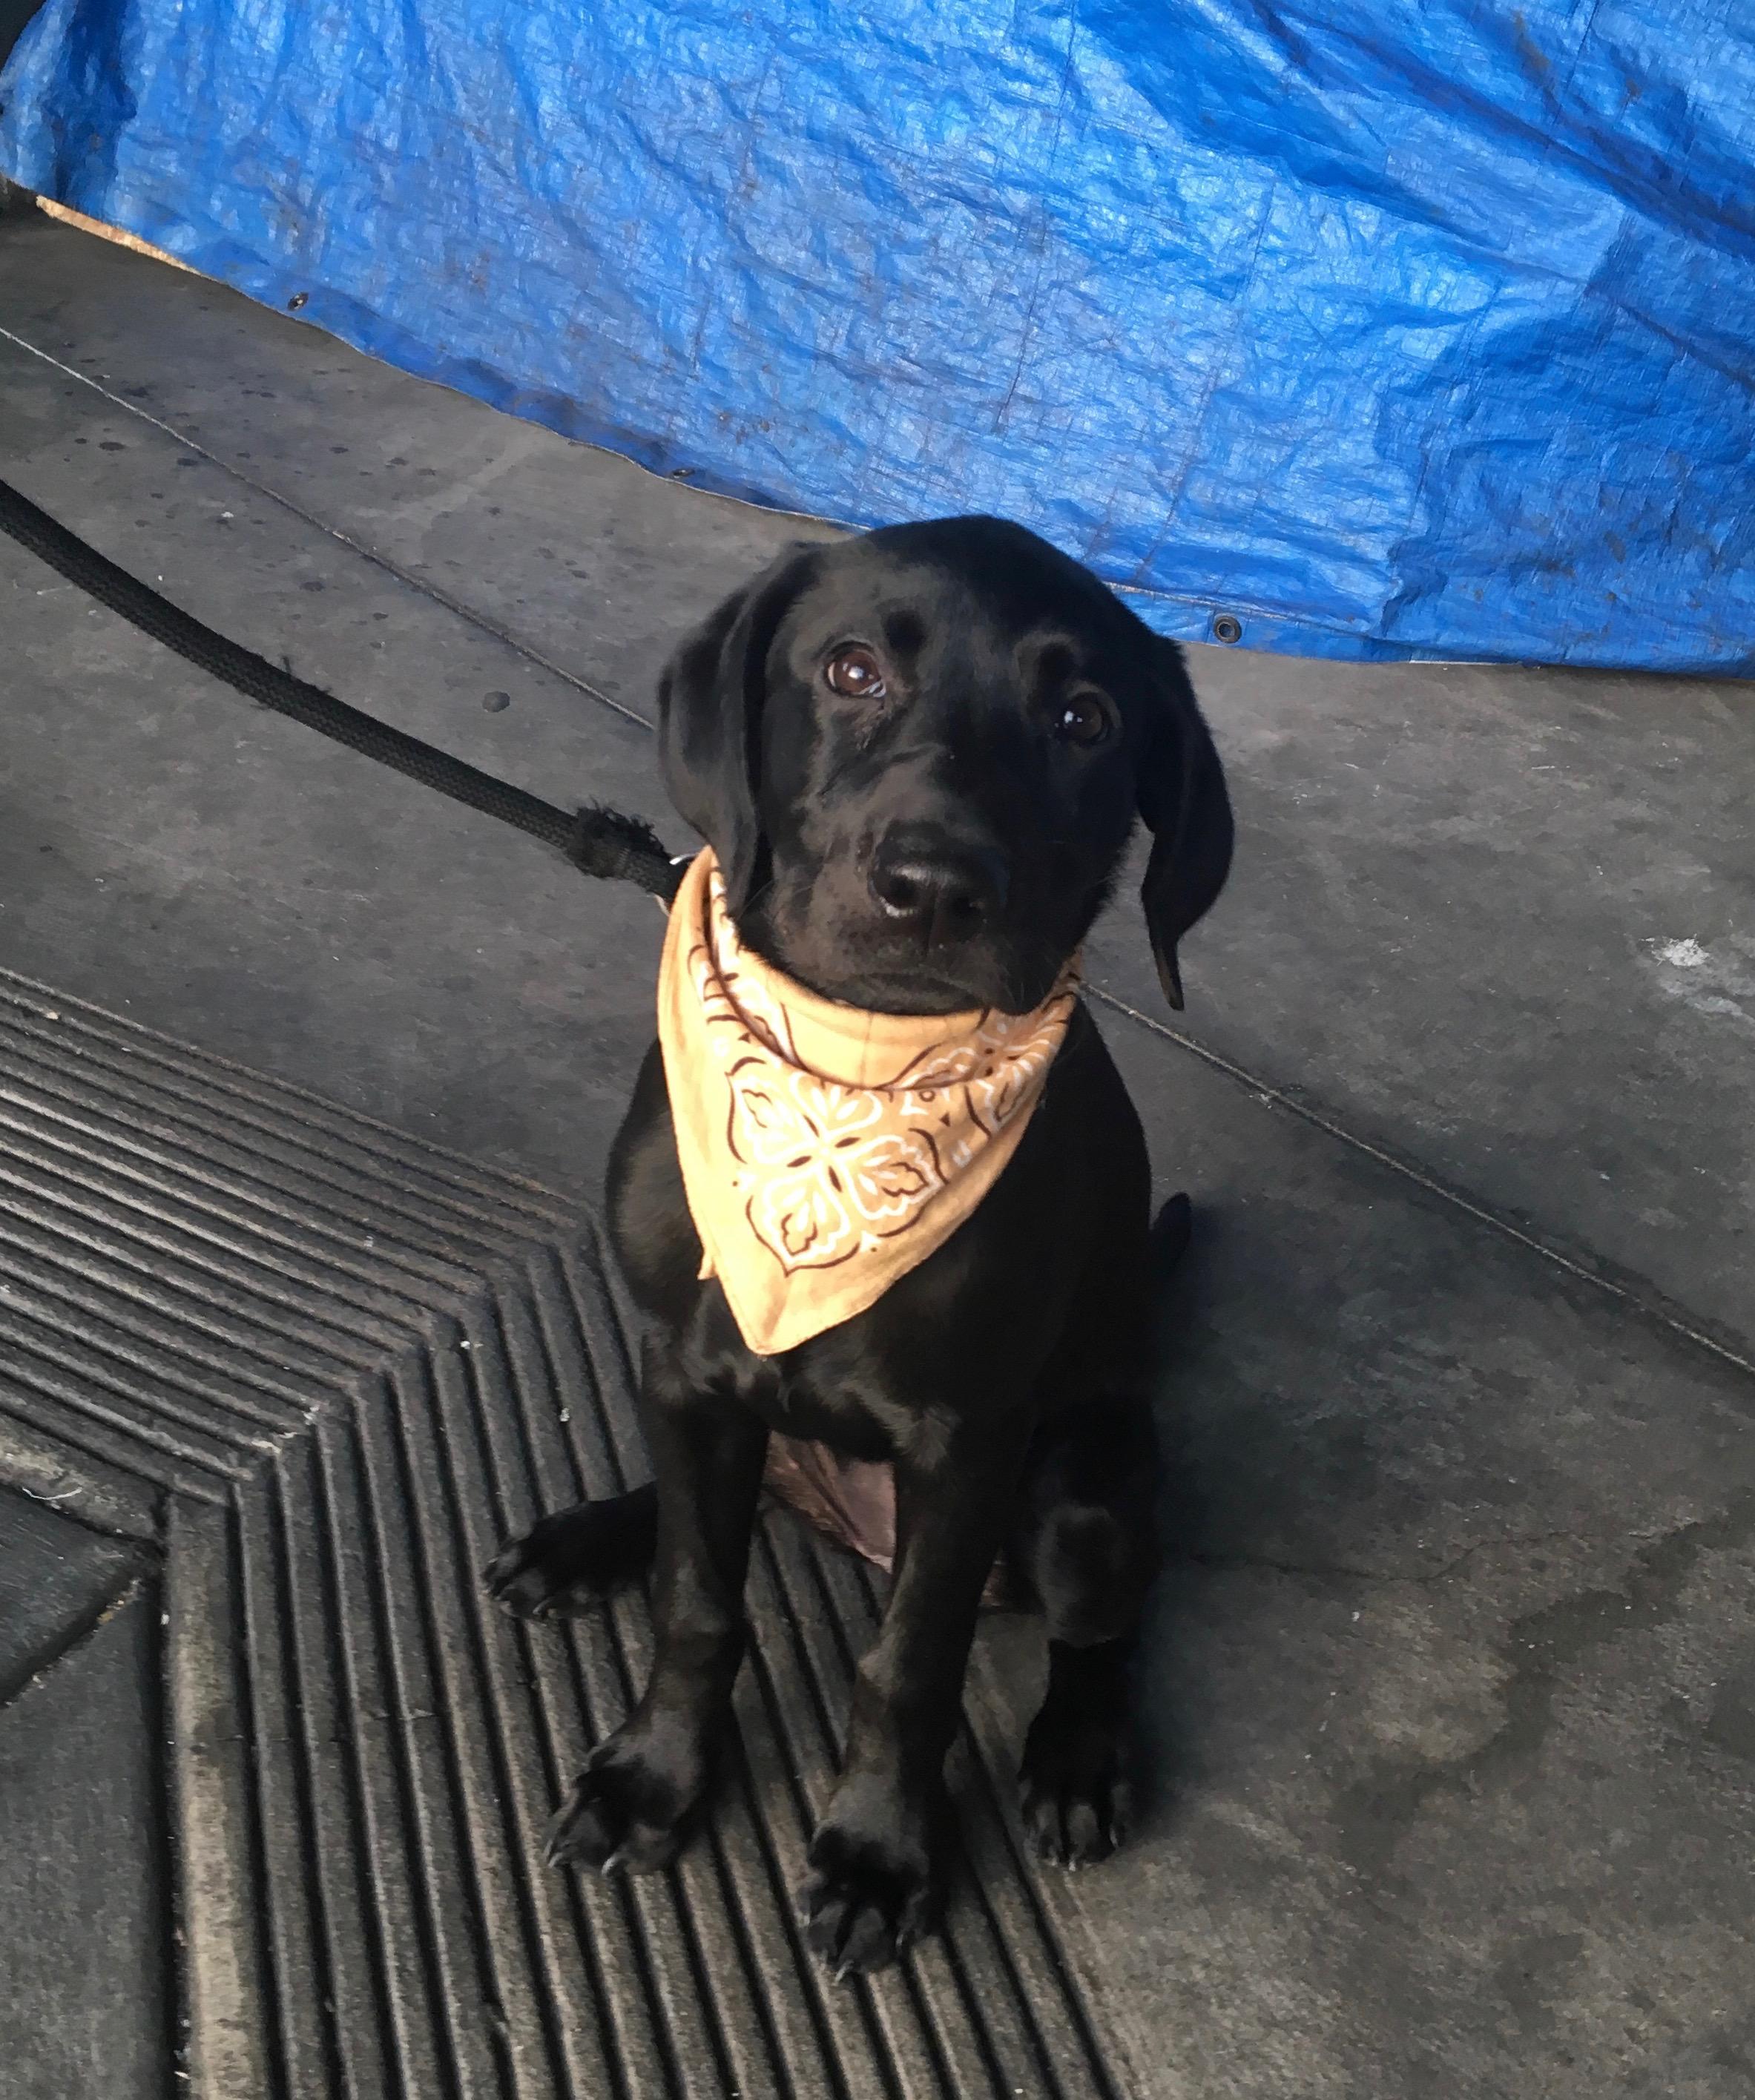 Black Labrador Retriever Puppy With Yellow Bandana